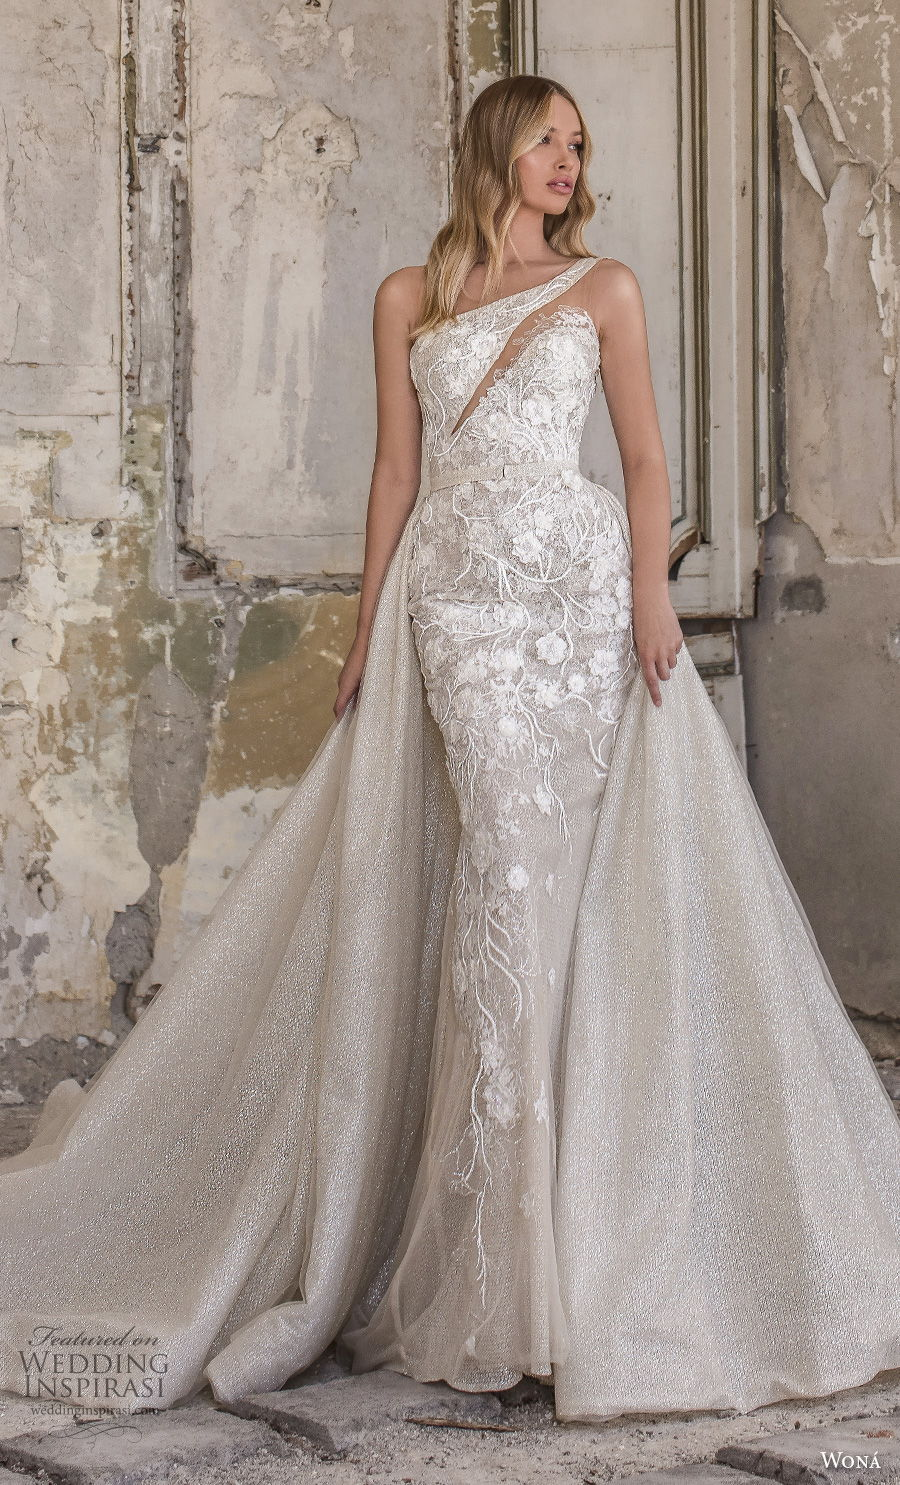 wona 2020 couture bridal one shoulder heavily embellished bodice elegant fit and flare sheath wedding dress a  line overskirt mid back short train (16) mv